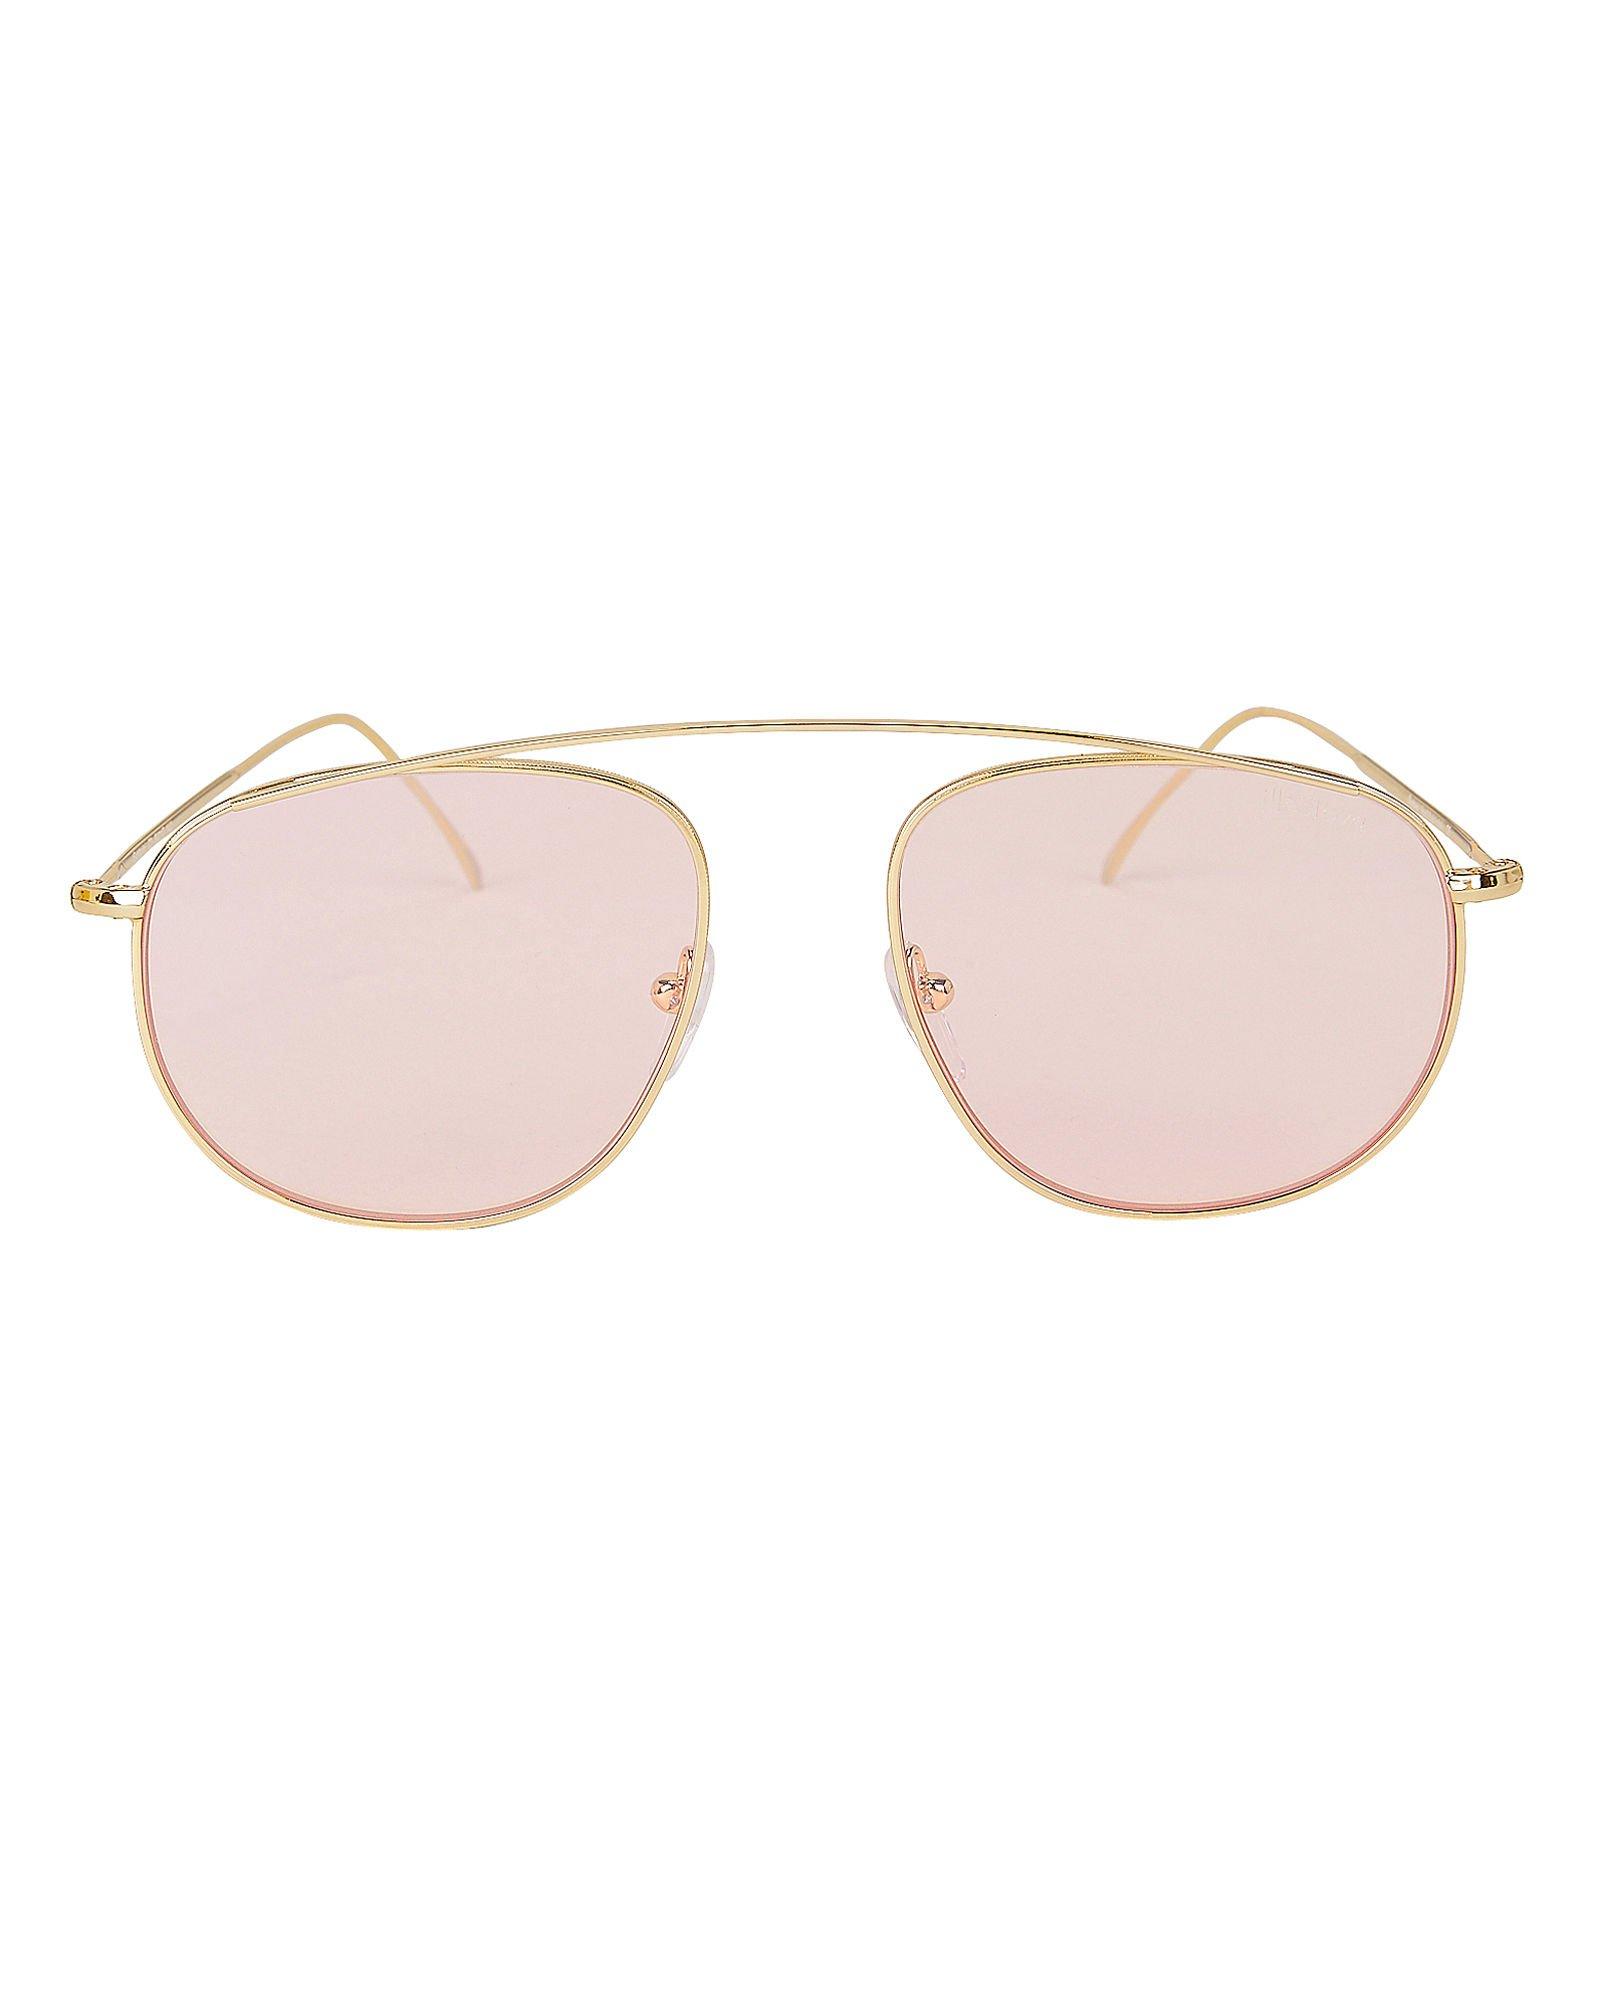 Illesteva | Santorini Gold Sunglasses